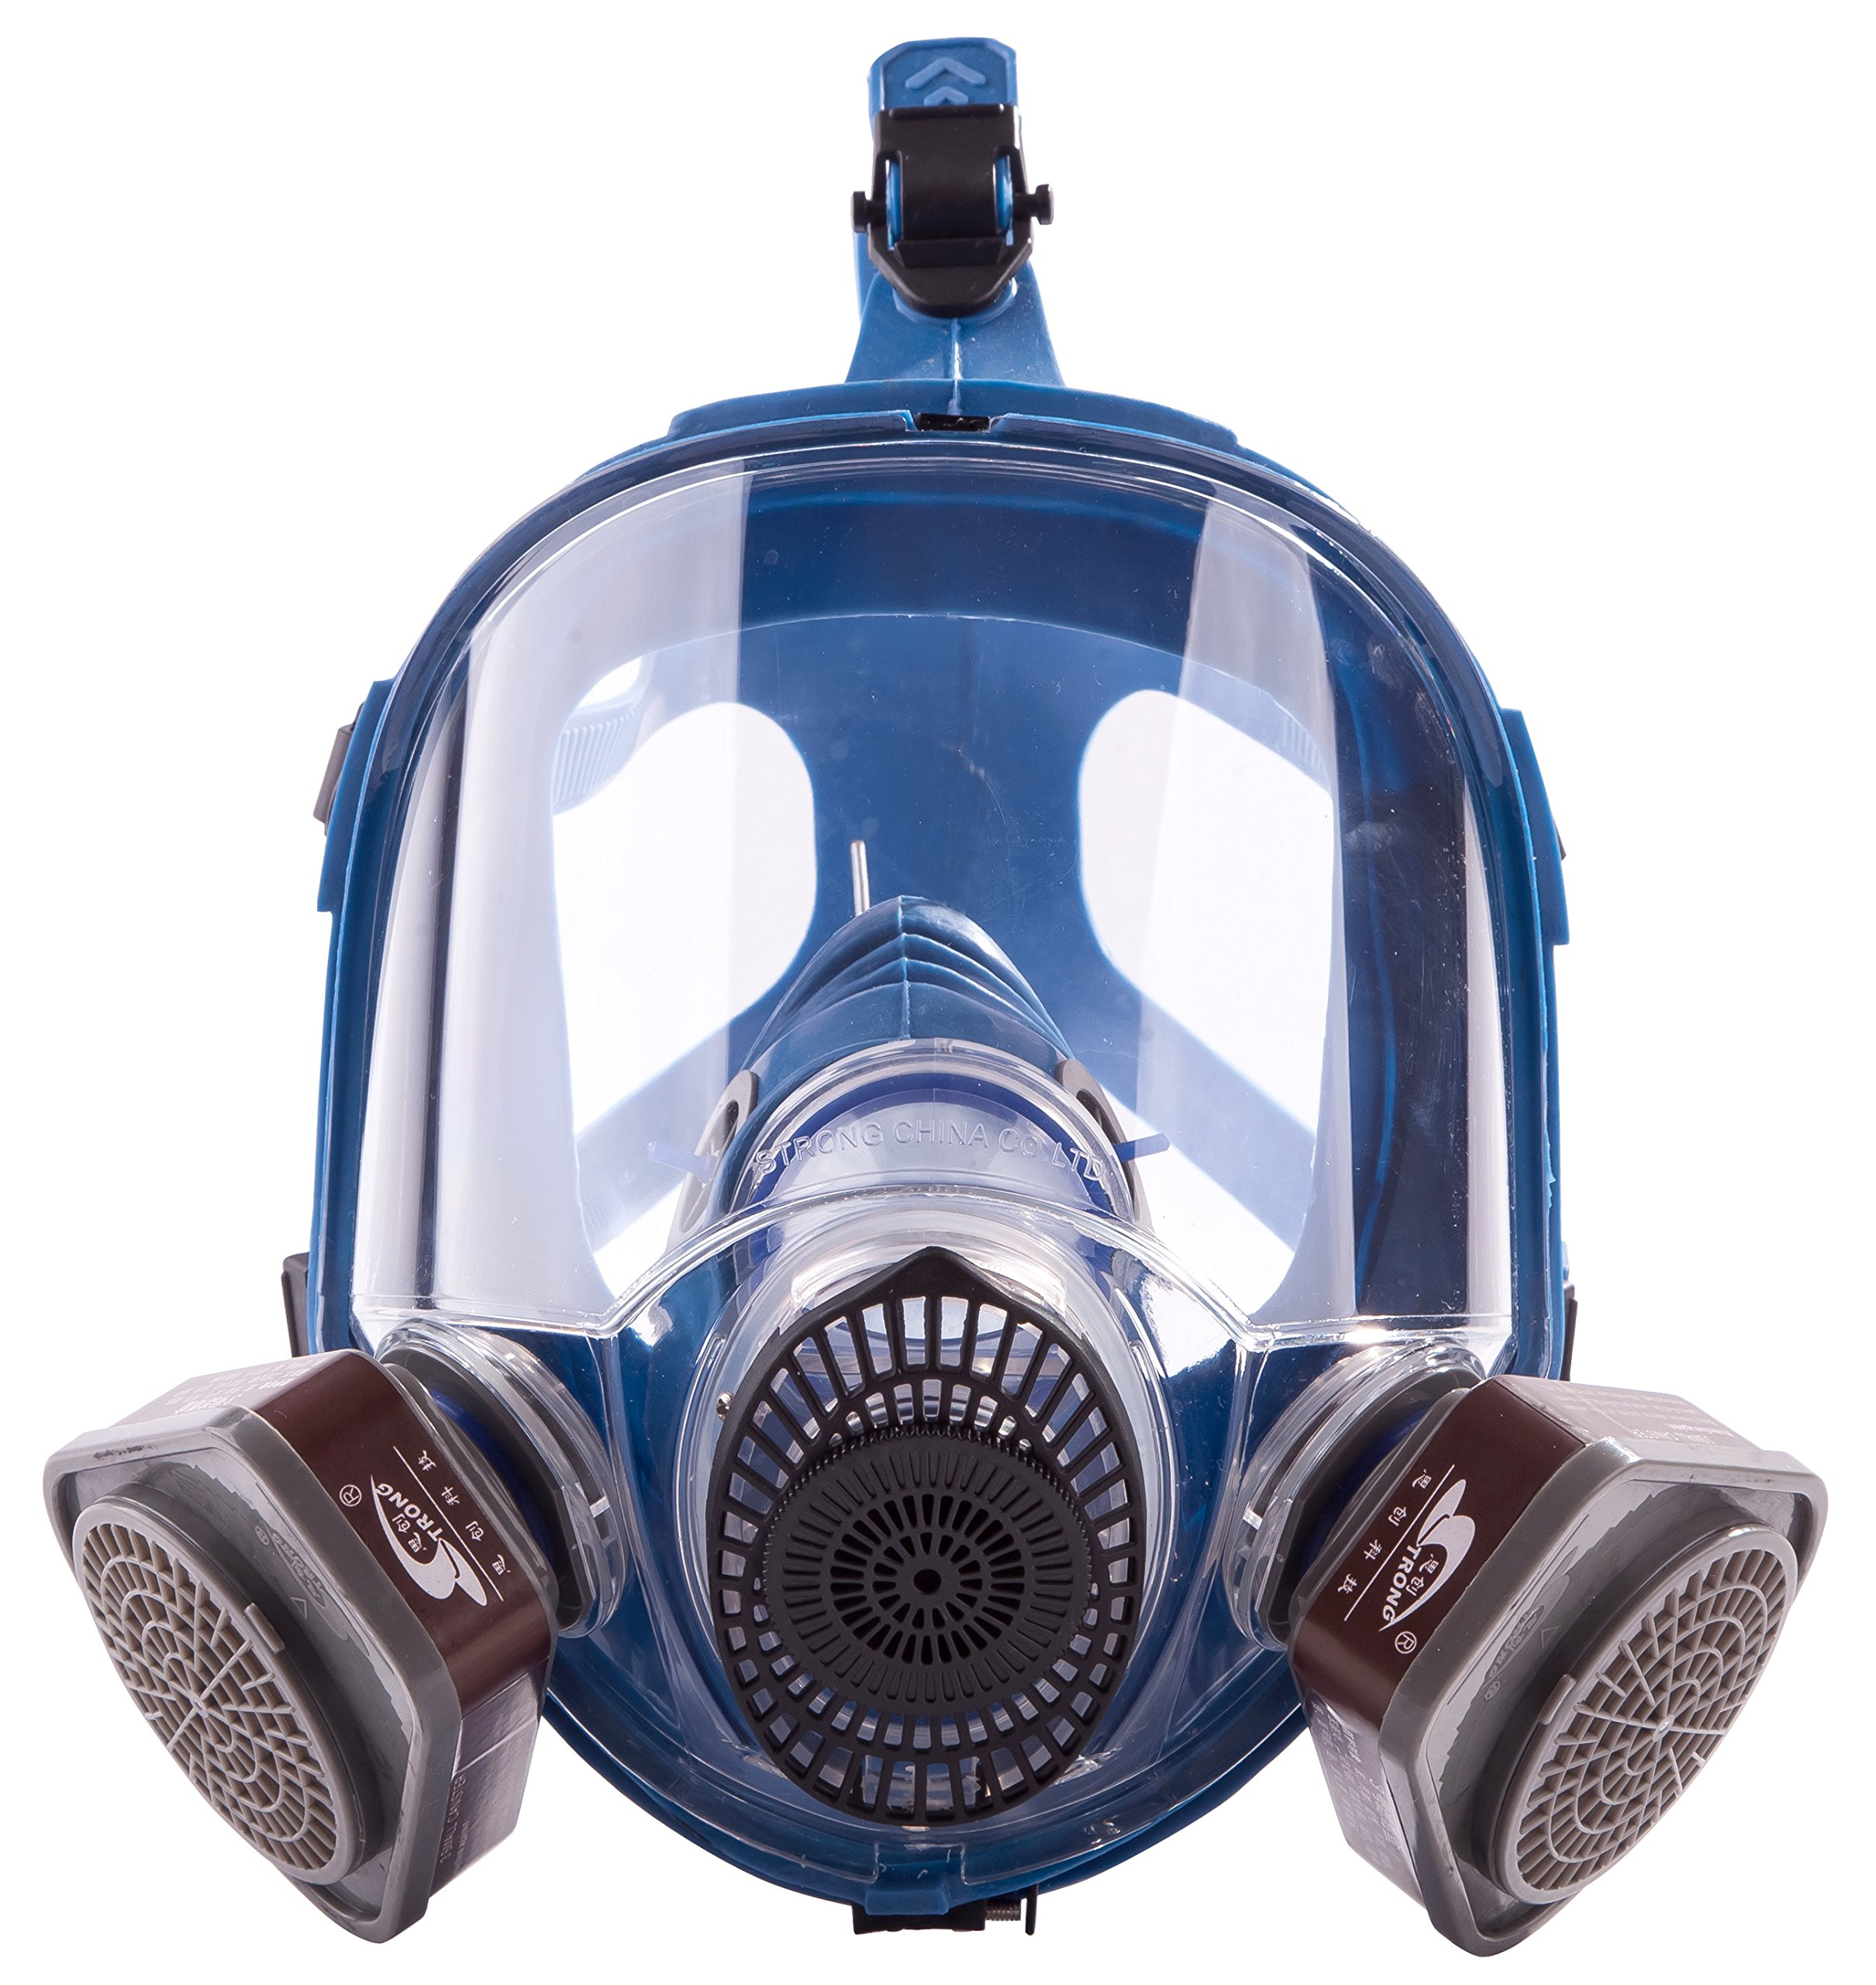 Induschoice Broad View Organic Vapor Full Face Respirator Mask Gas Mask Paint Pesticide Chemical Formaldehyde Anti Virus Respiratory Protection(Respirator +1 Pair Cartridges) by Induschoice